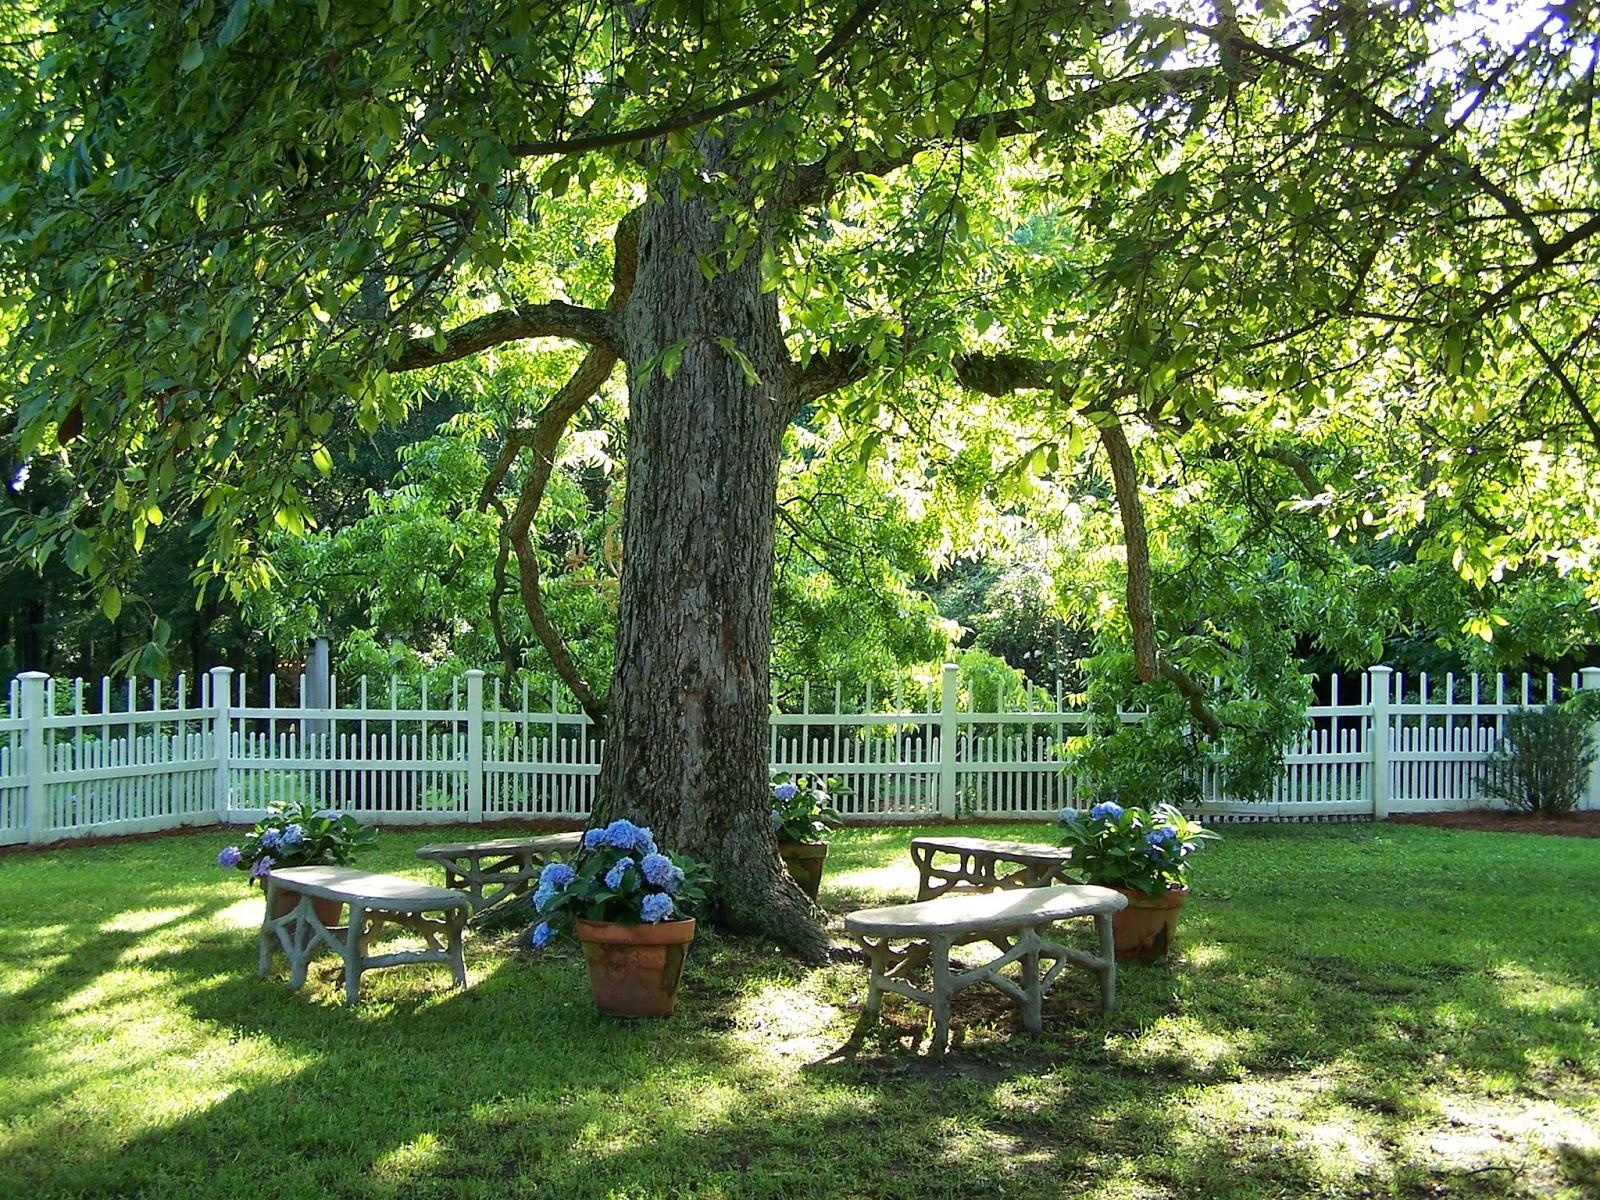 Tara dillard garden design course free in a single pic for Landscape design training